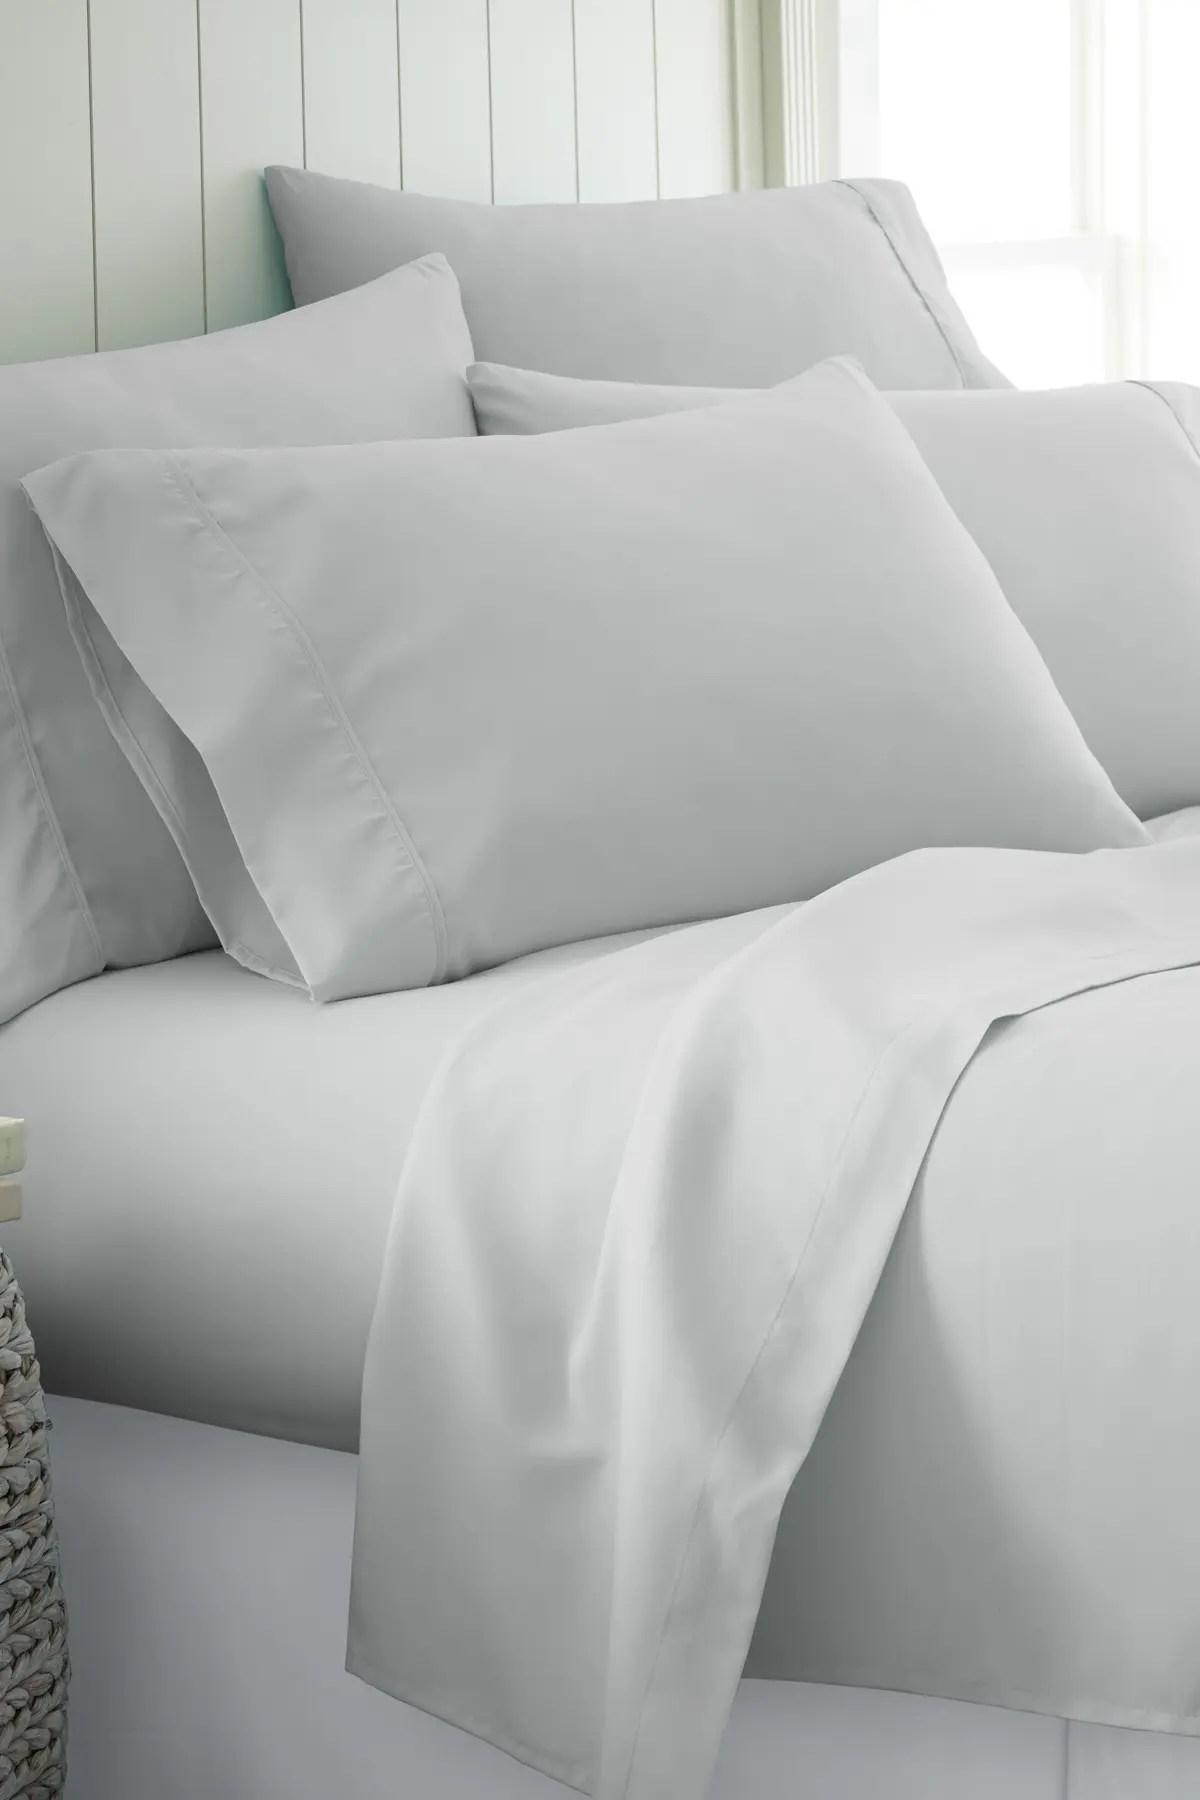 luxury bedding nordstrom rack